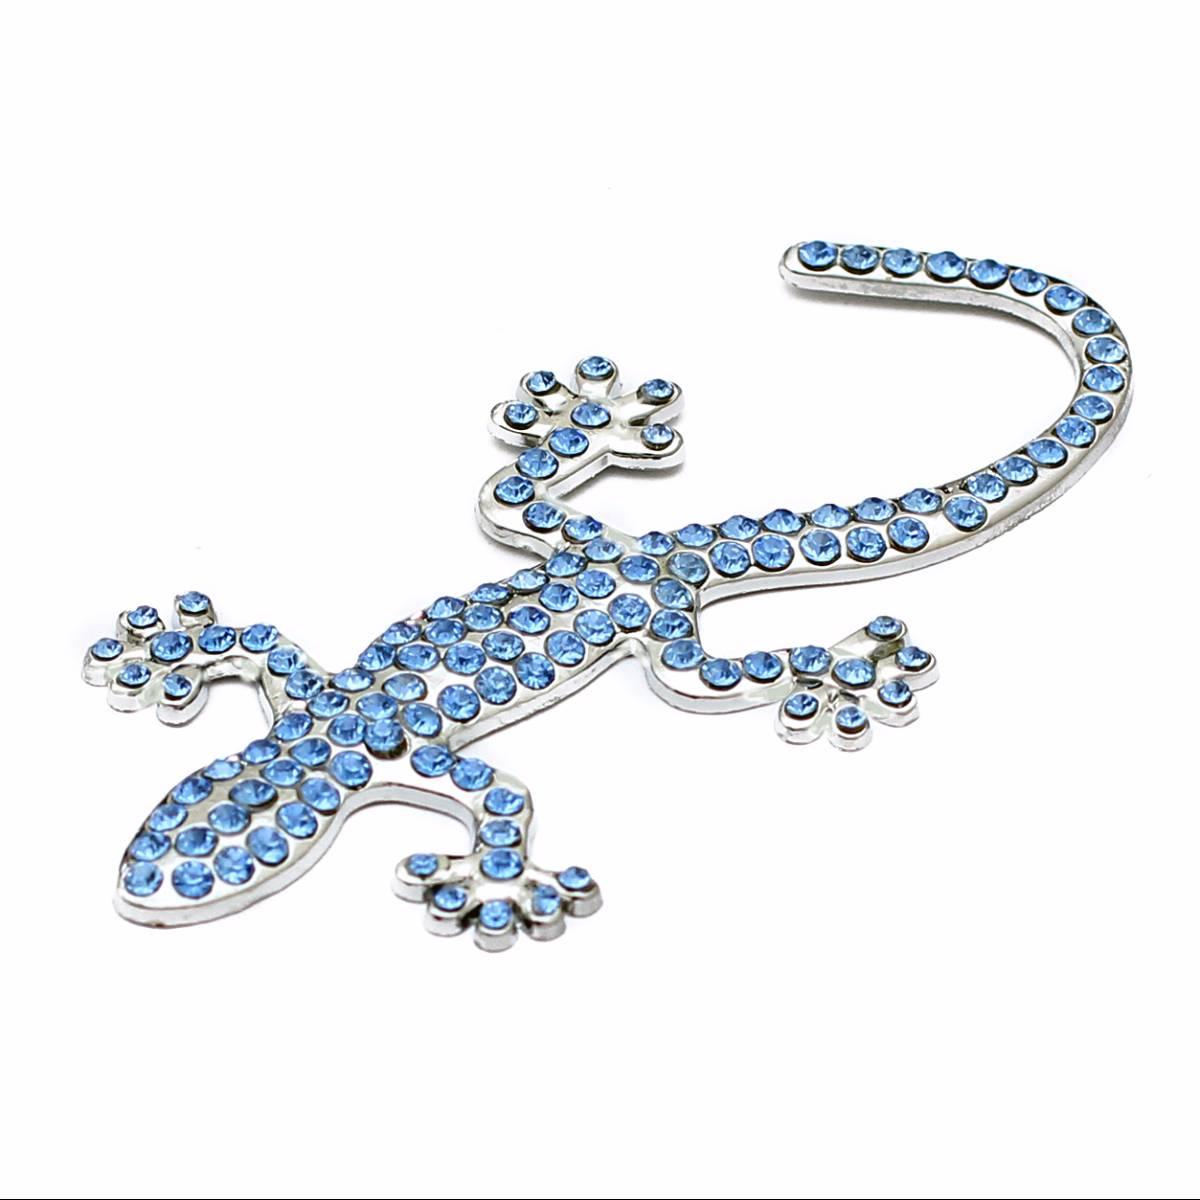 Emblem Variasi Gecko - Blue1